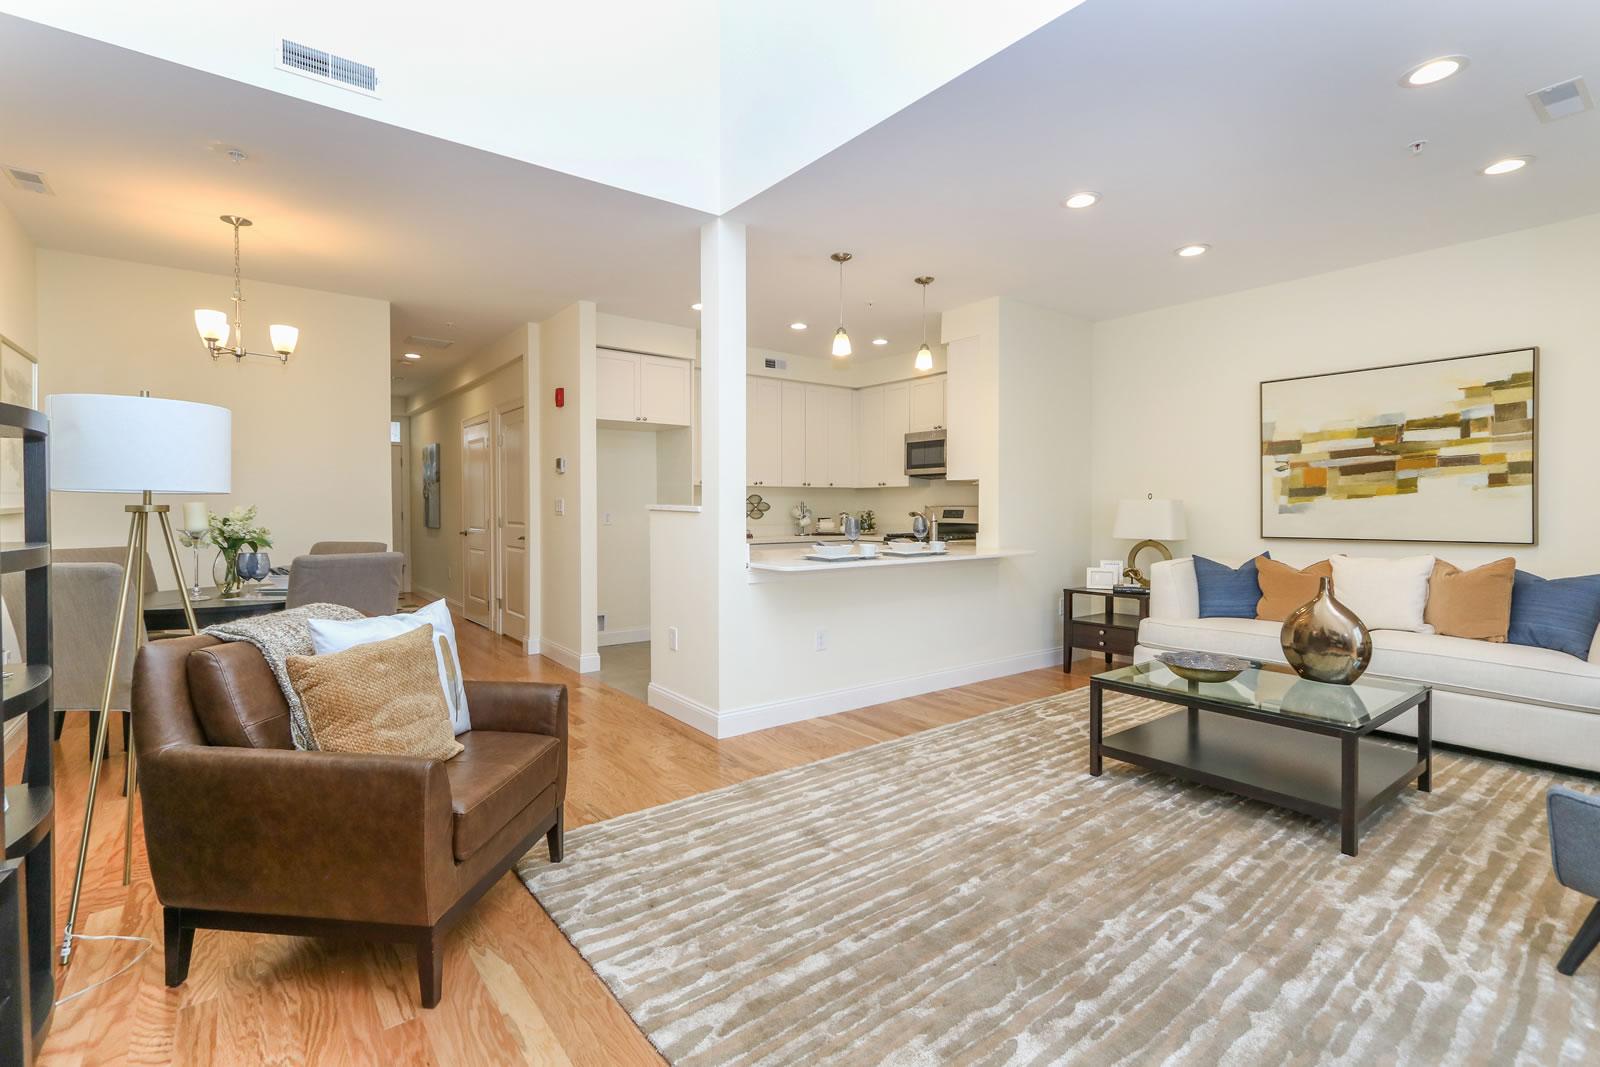 Model Home | Endicott Woods Condiminiums